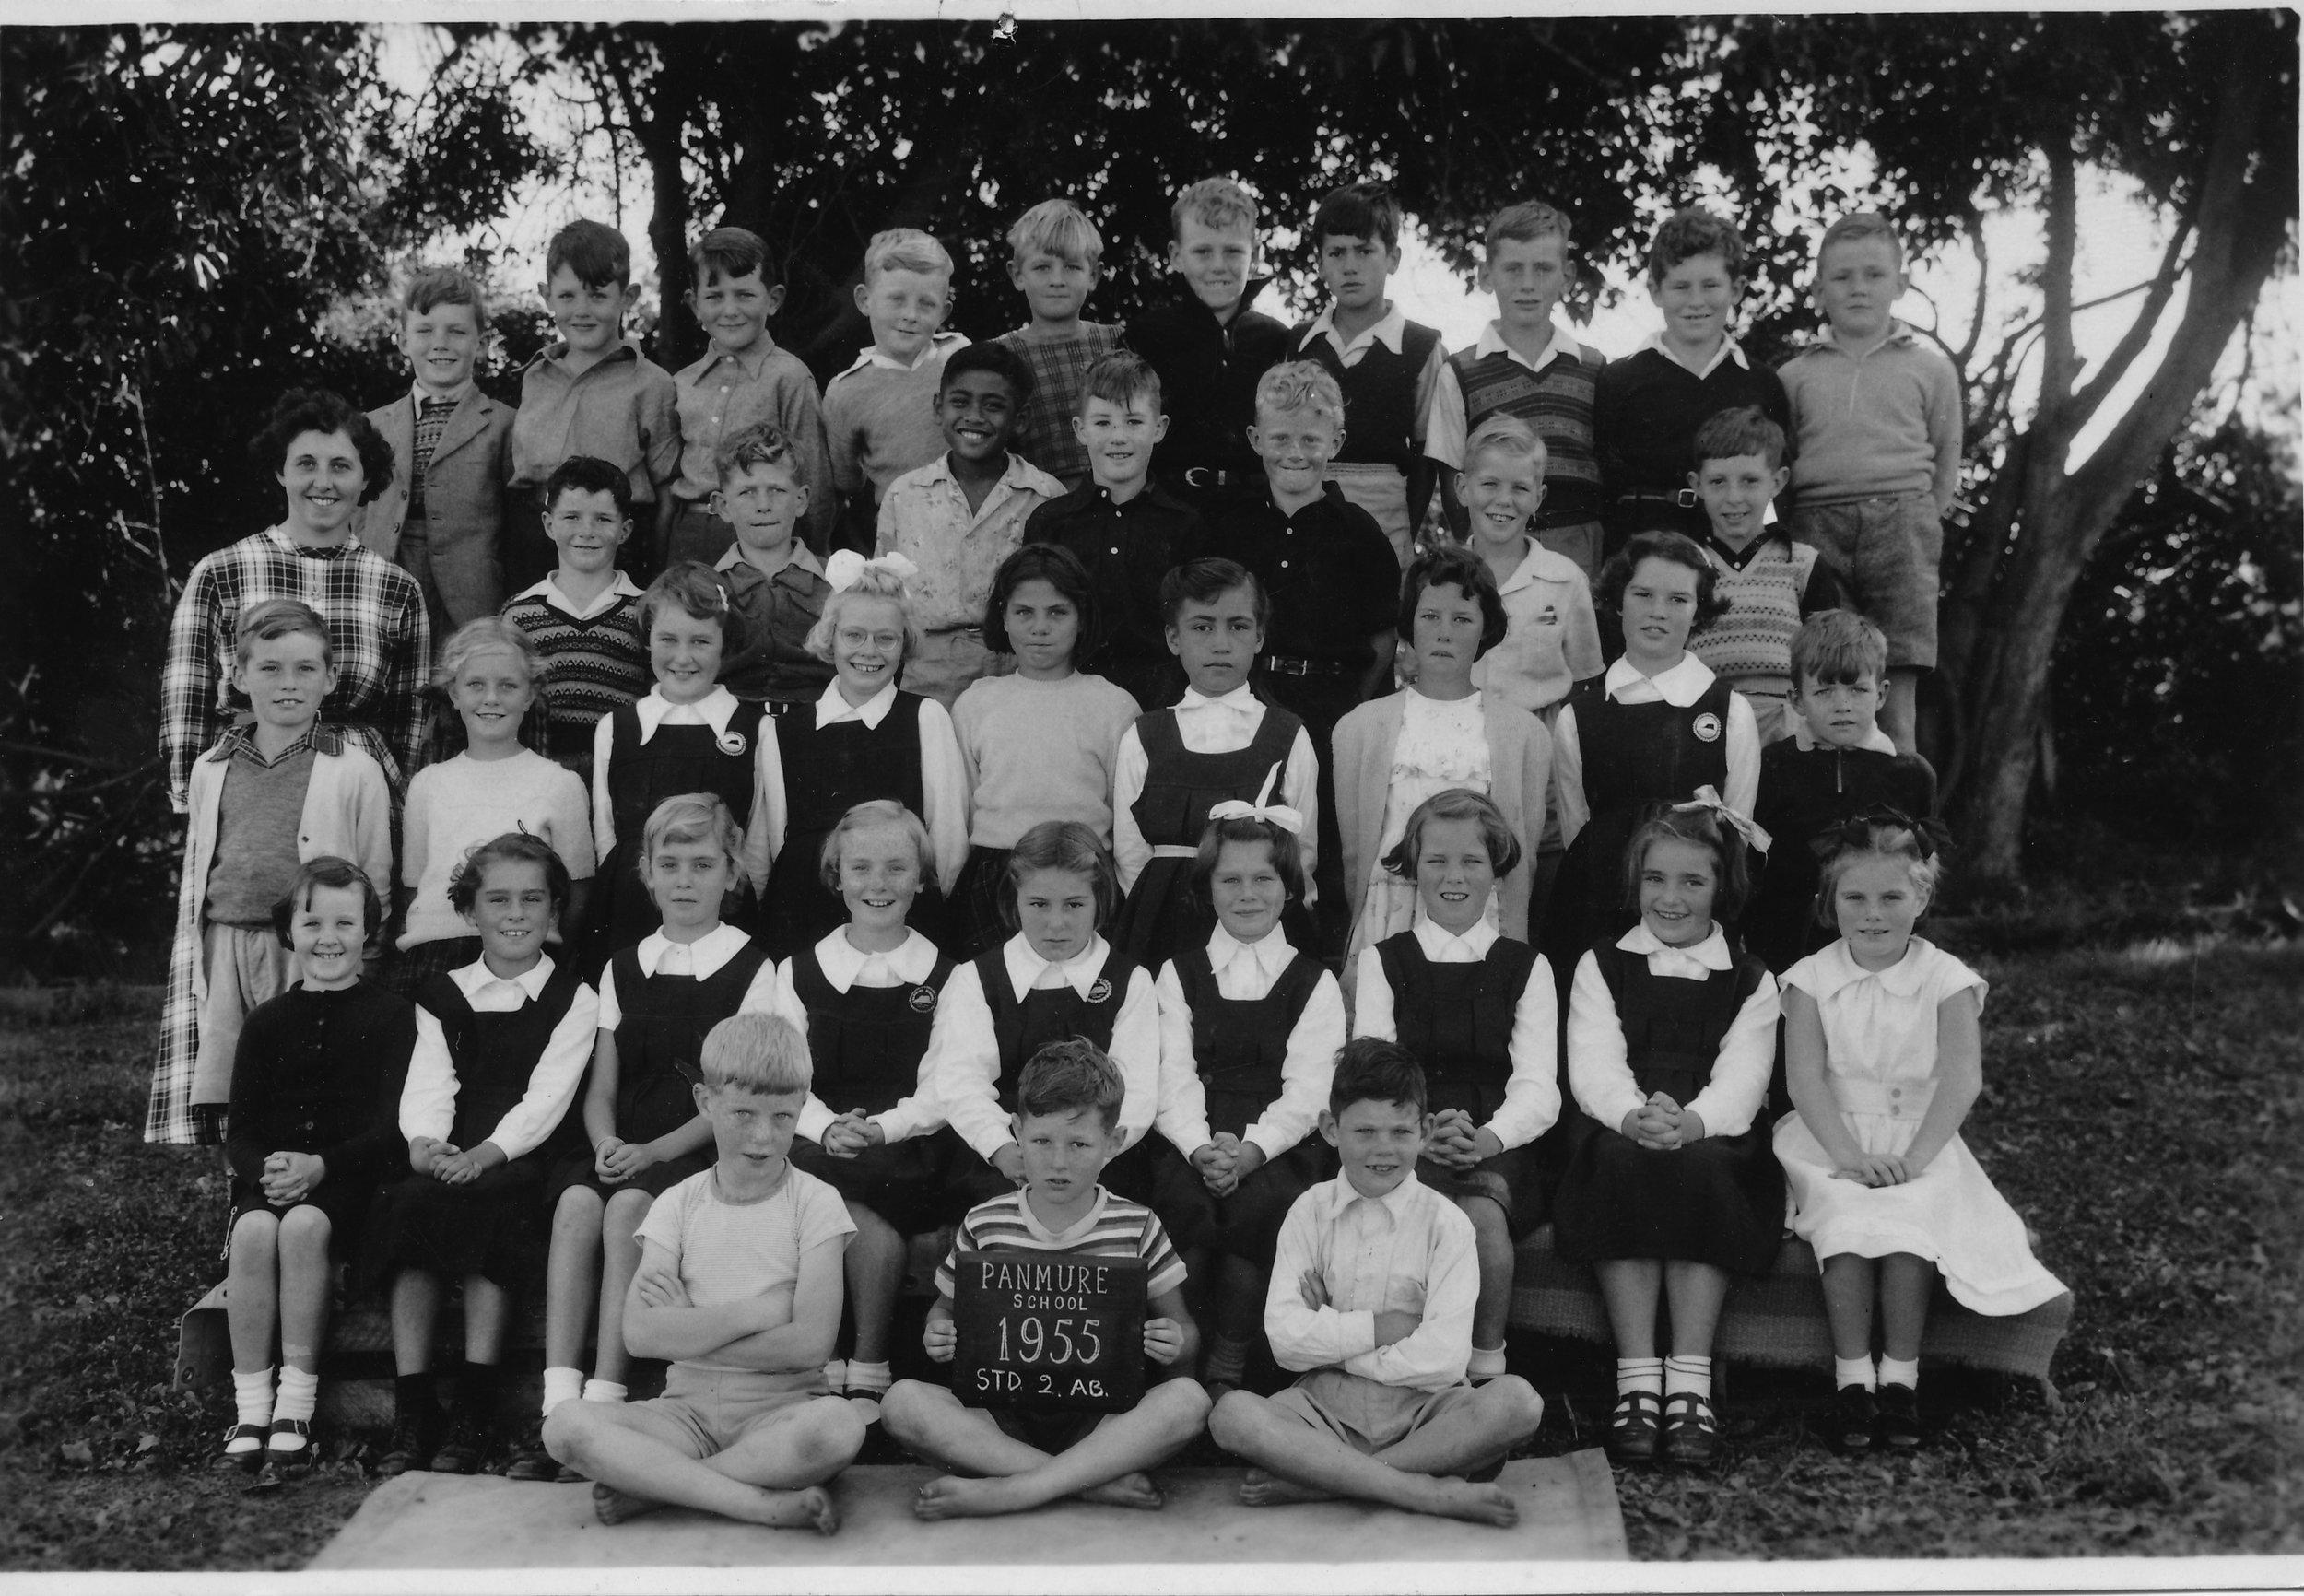 Panmure School class of Miss Lorraine Abraham. Image credit: Jordan Lapish. 1955.